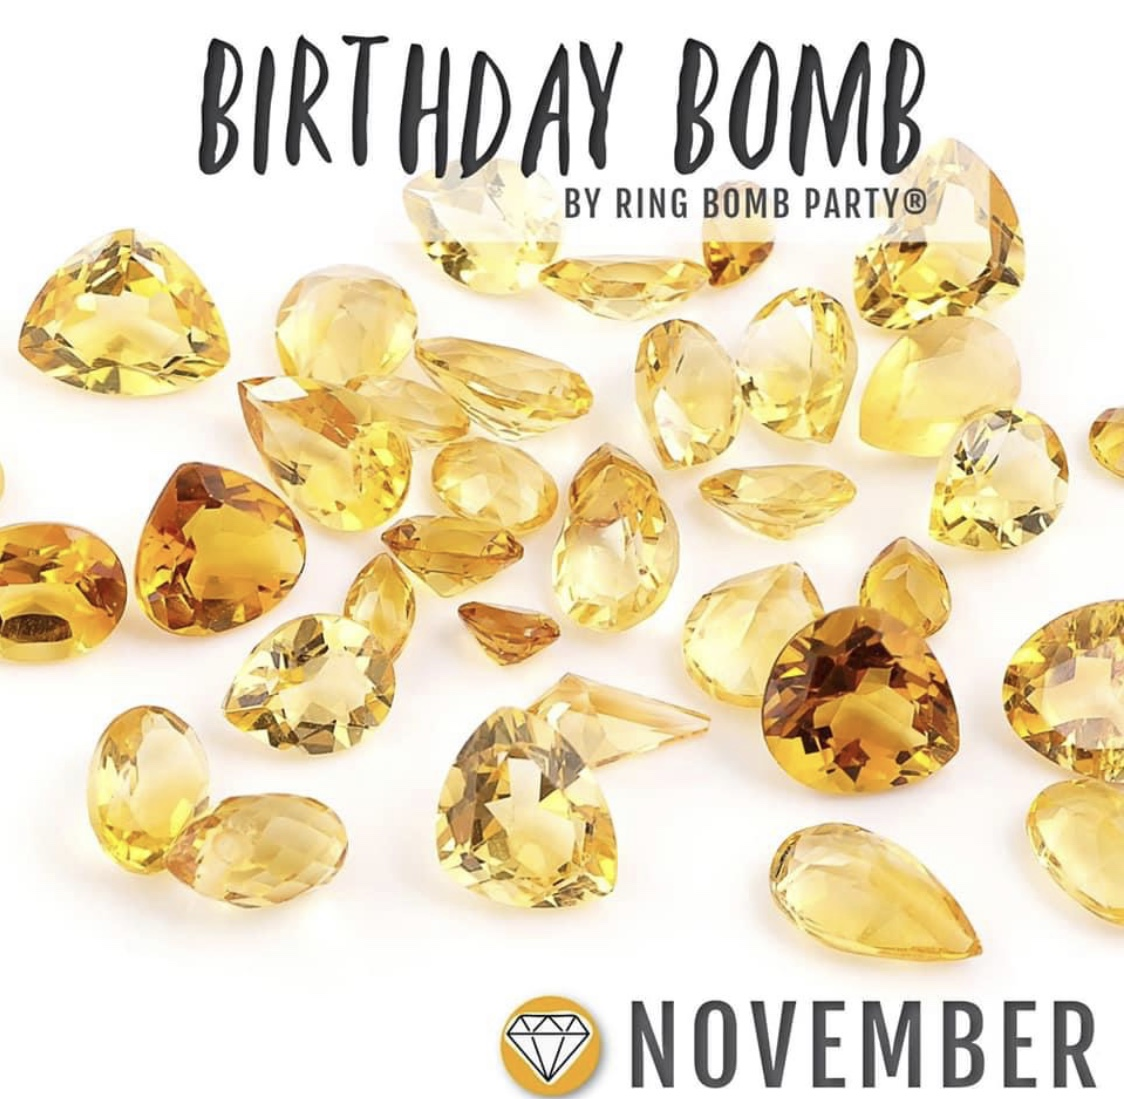 November Birthday Bomb Preorder